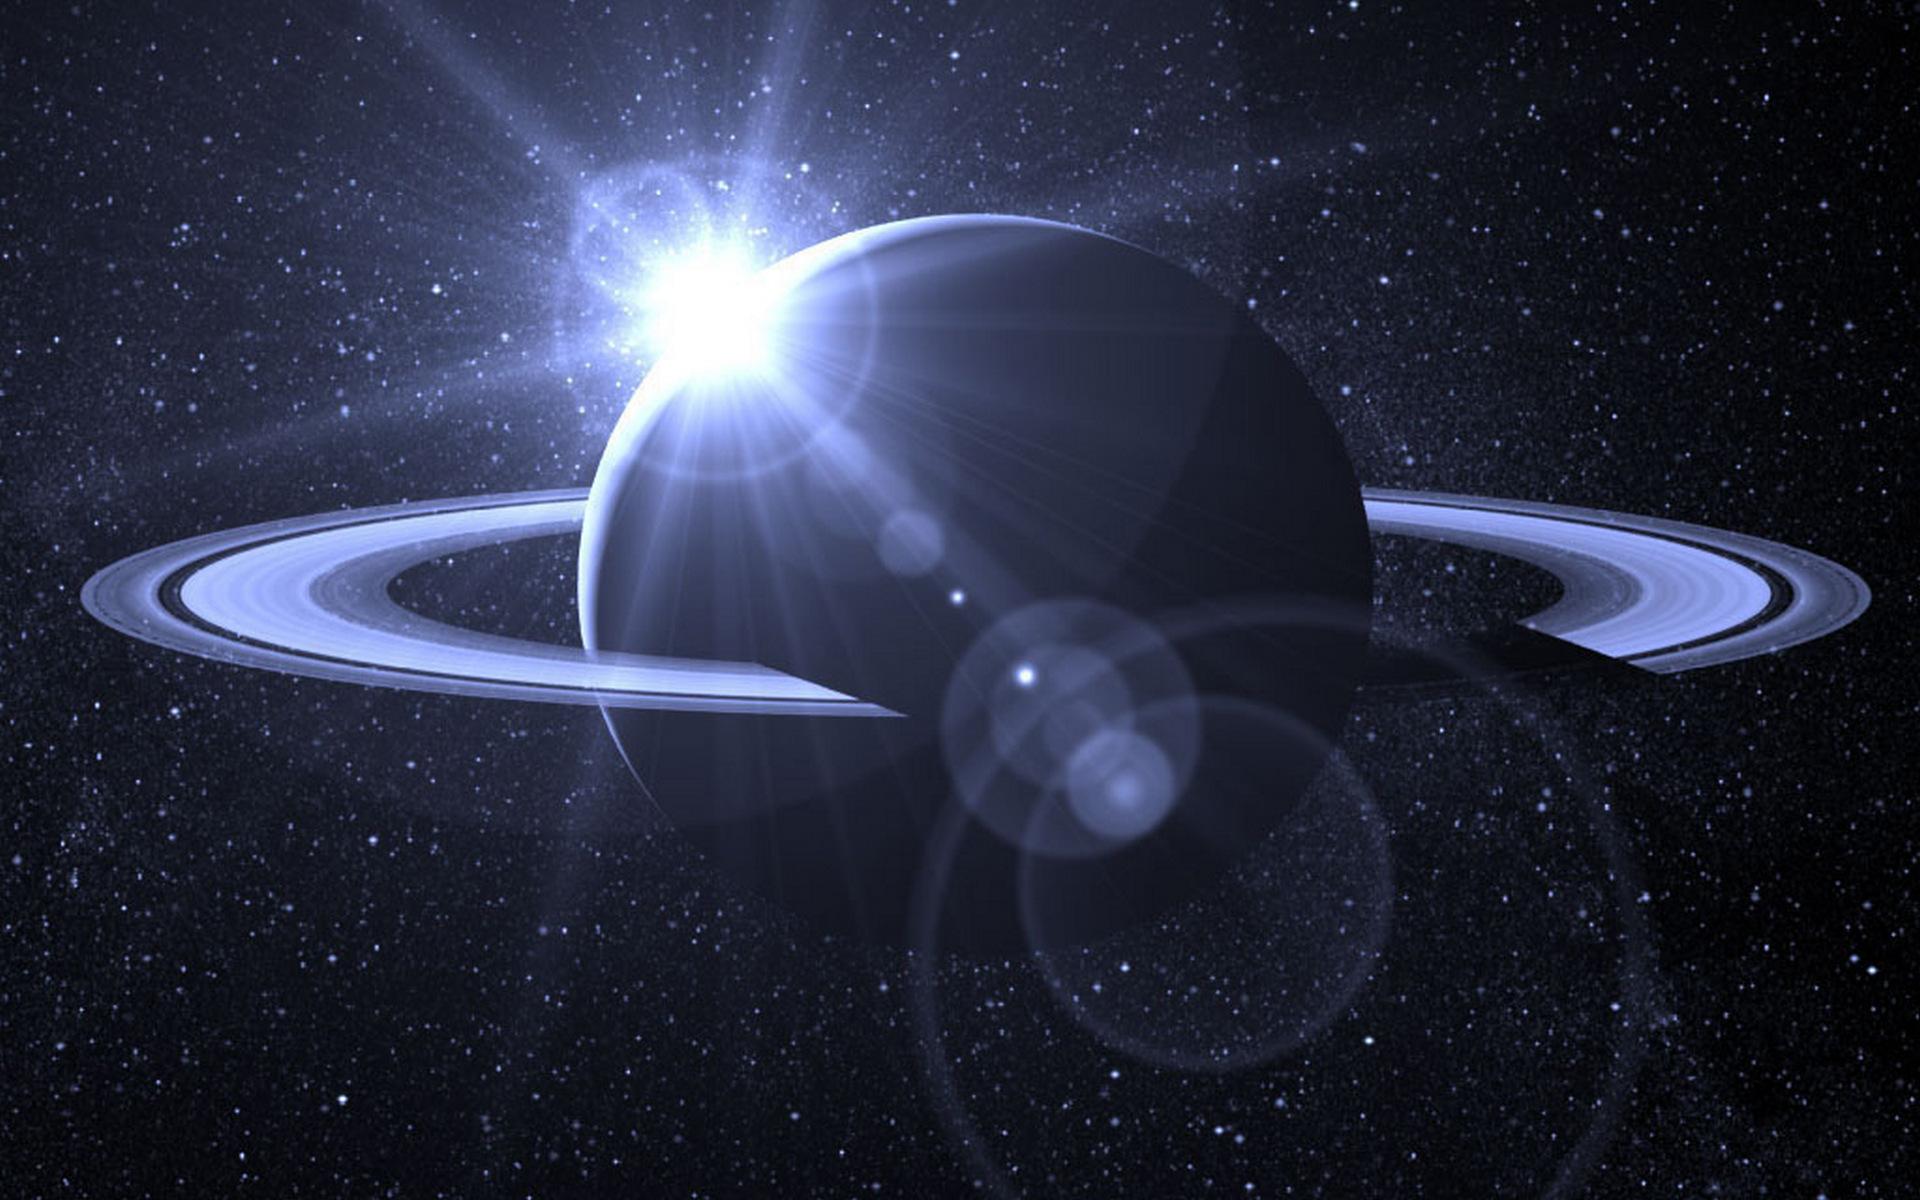 сатурн и солнце, космос, обои на рабочий стол, space wallpaper